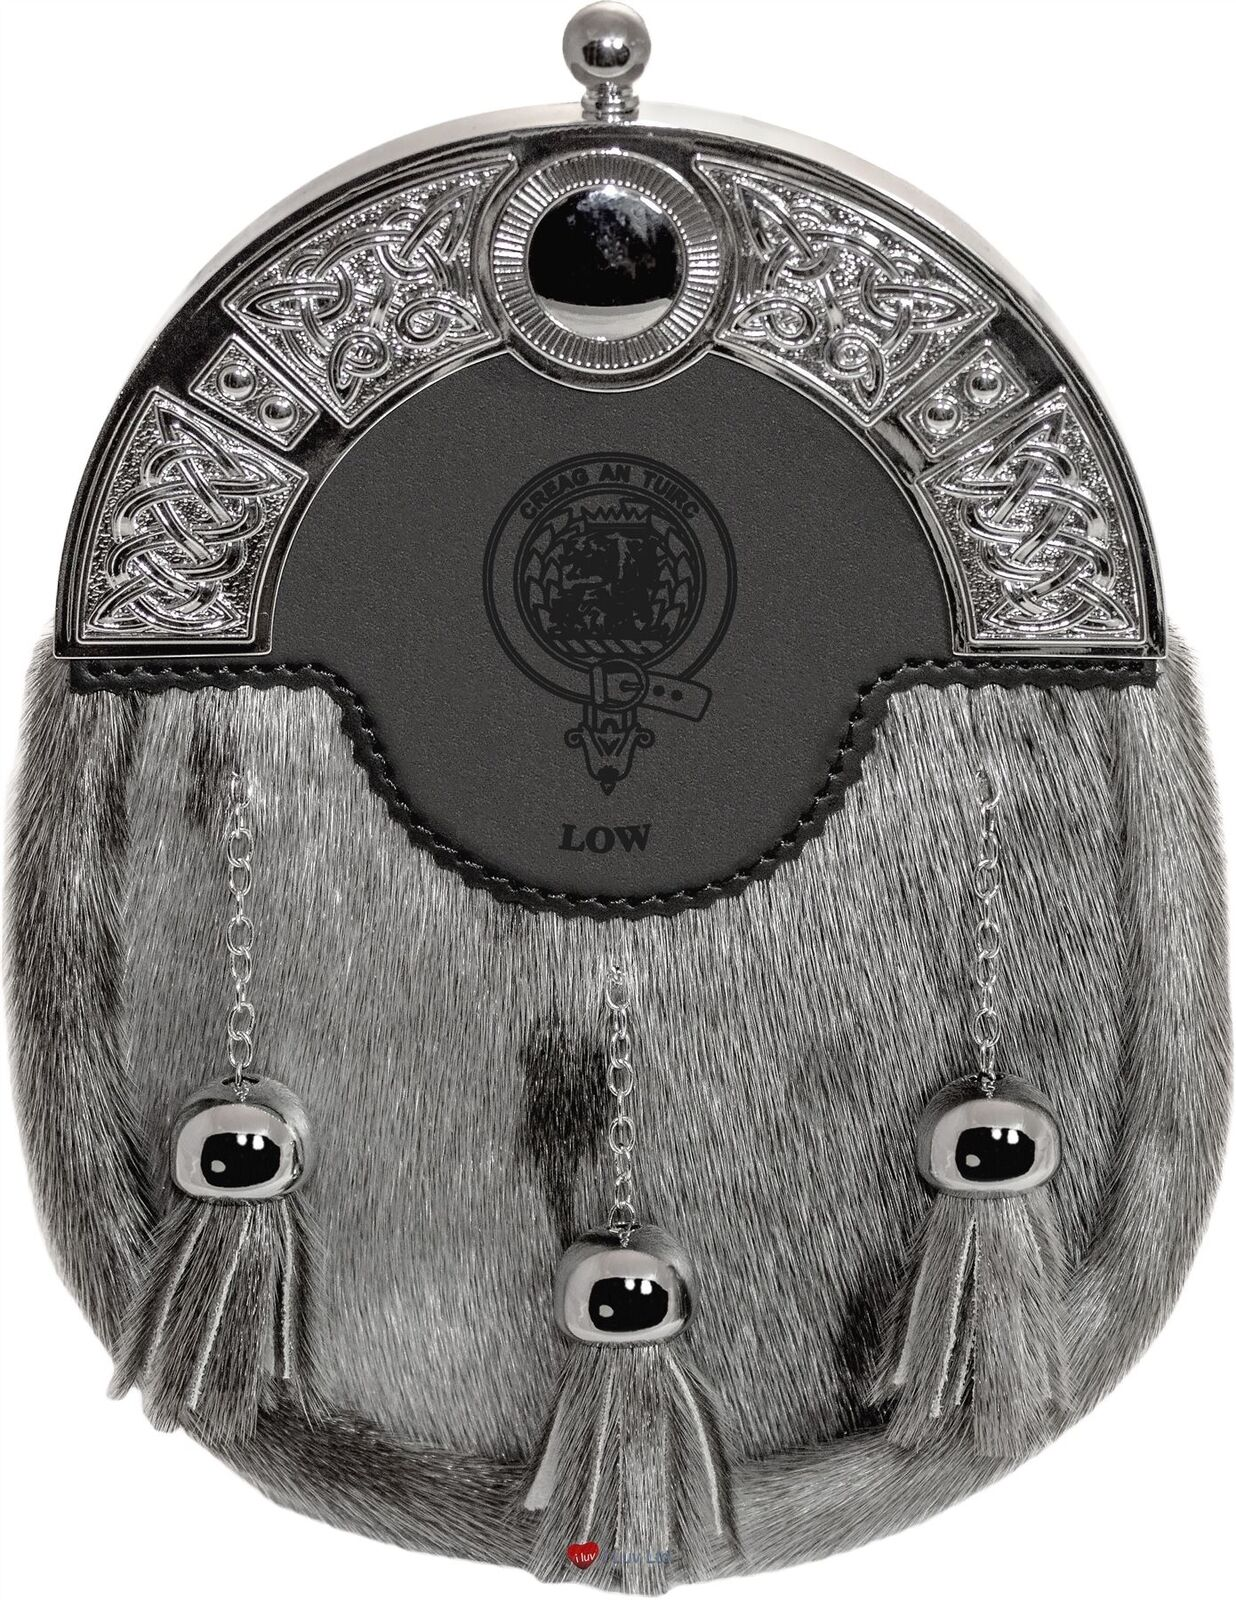 Low Dress Sporran 3 Tassels Studded Celtic Arch Scottish Clan Crest